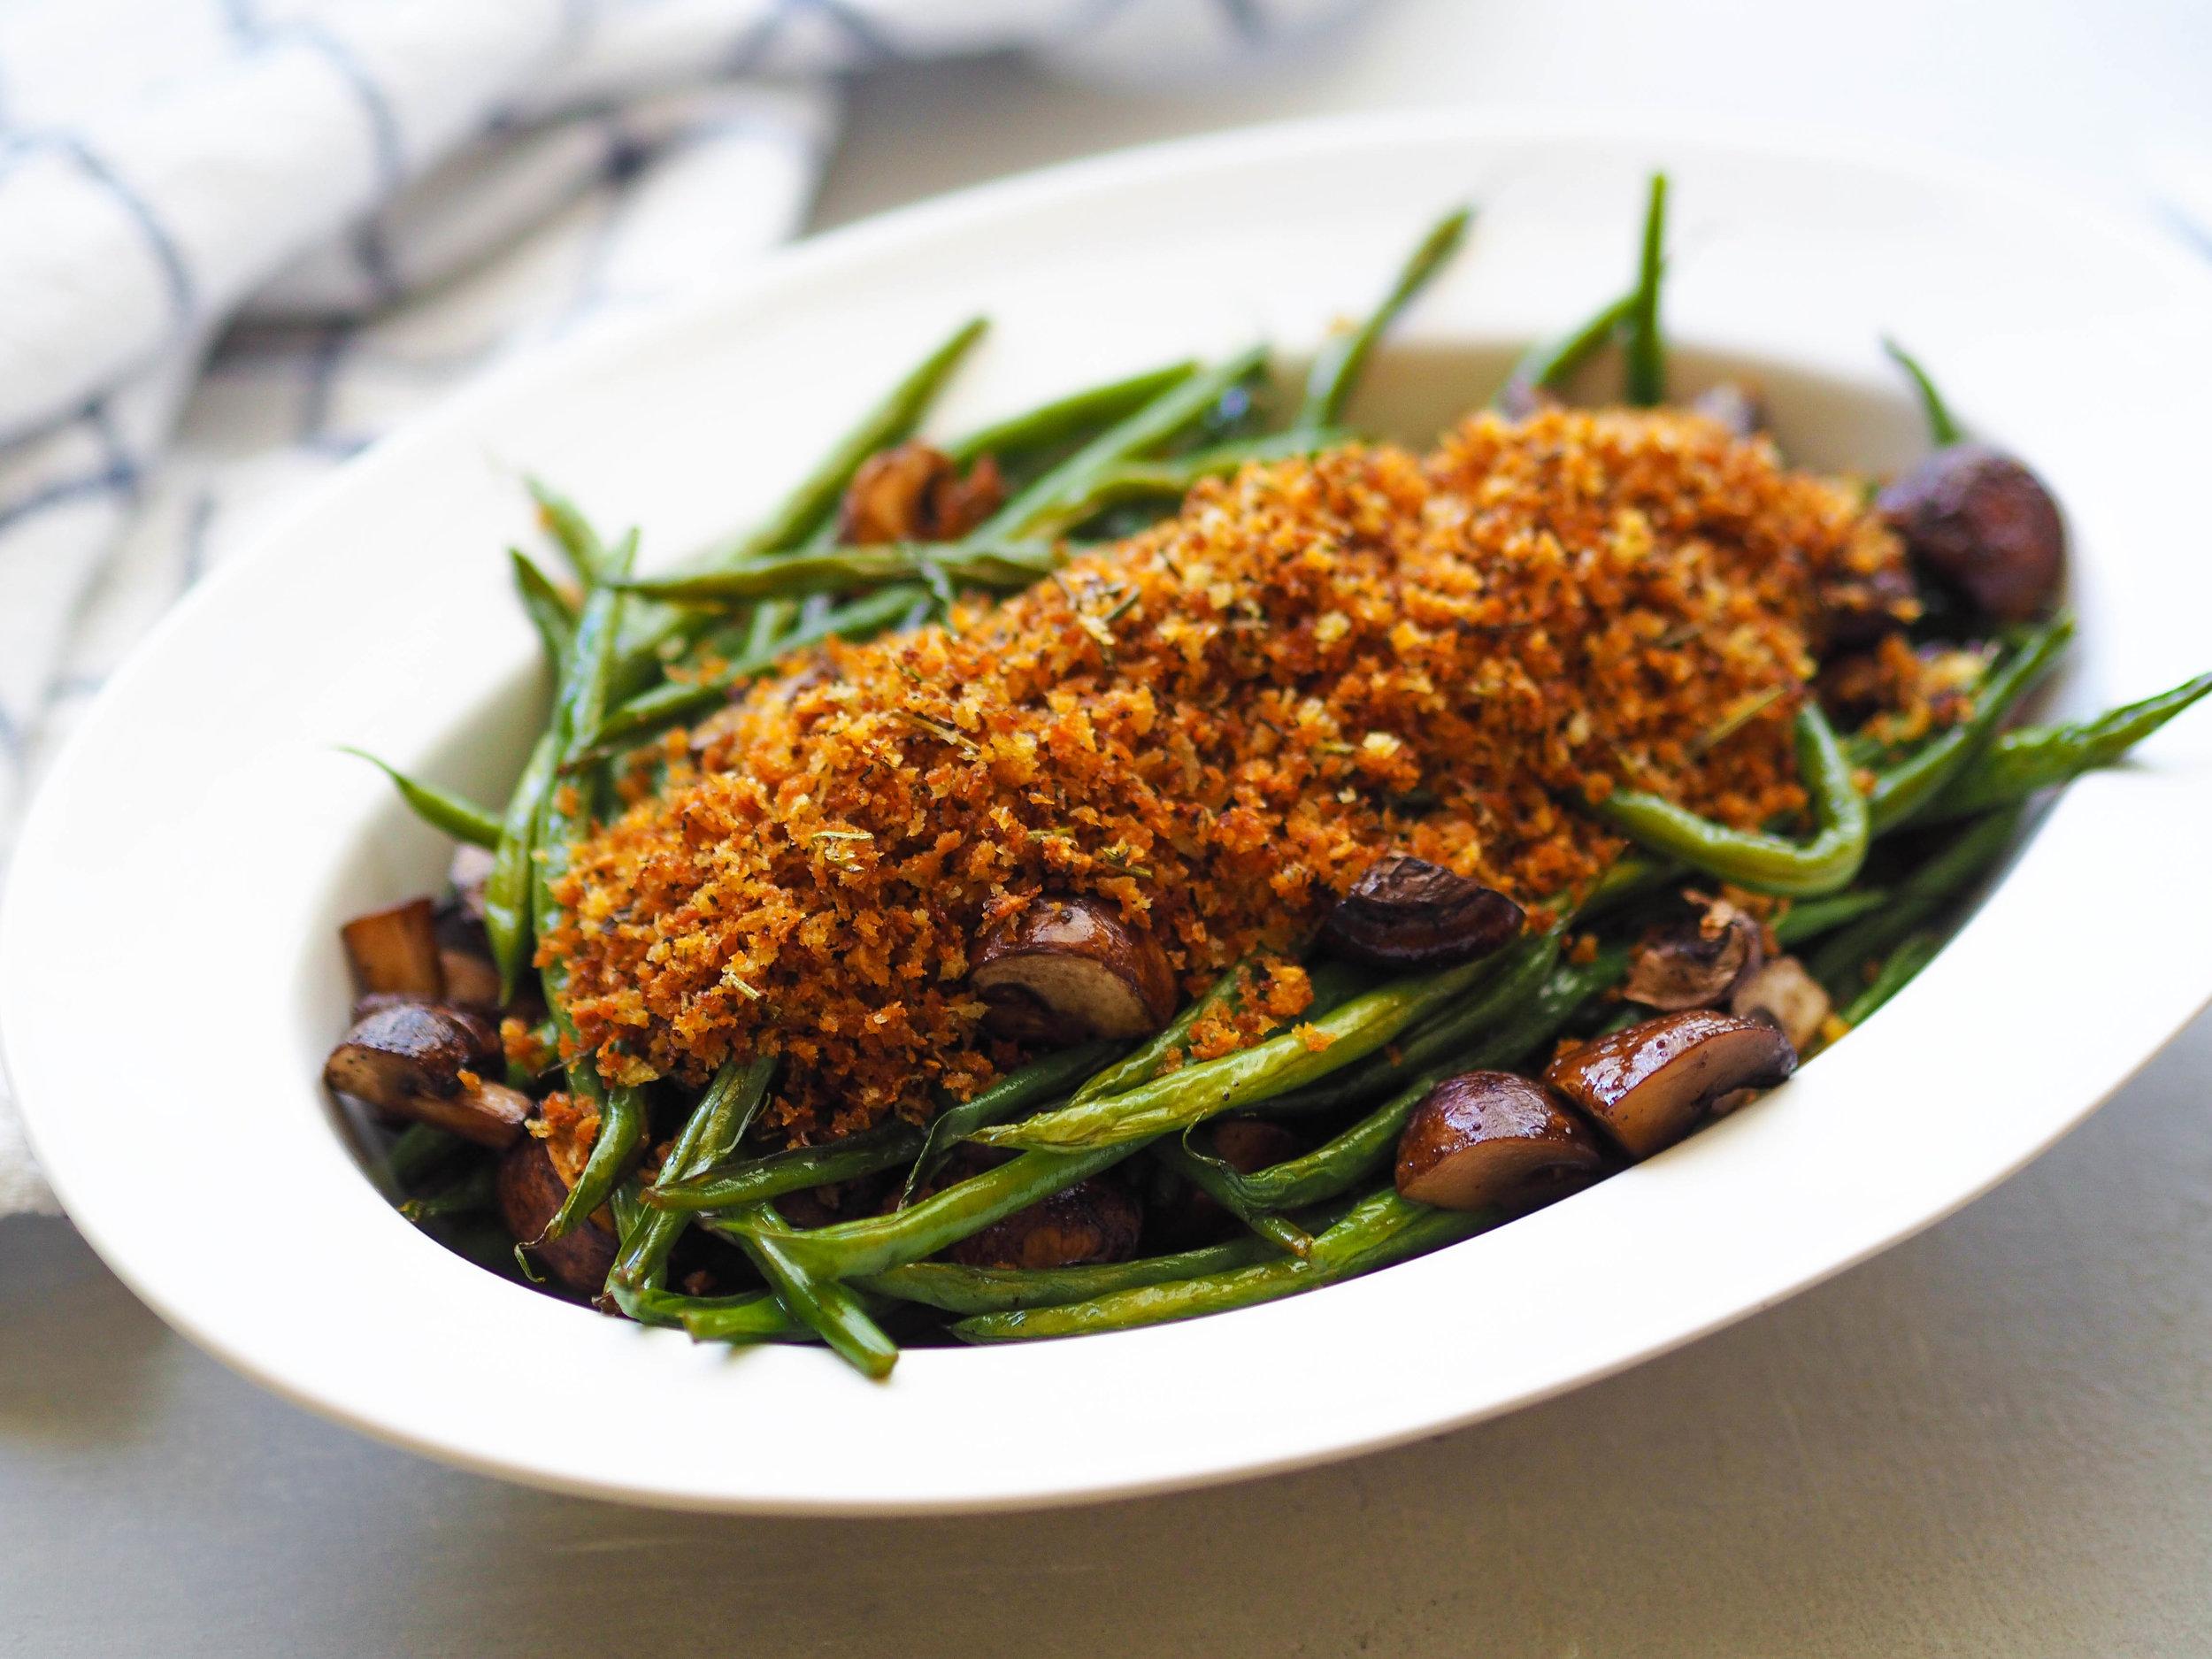 roasted-green-beans-and-mushrooms-1.jpg